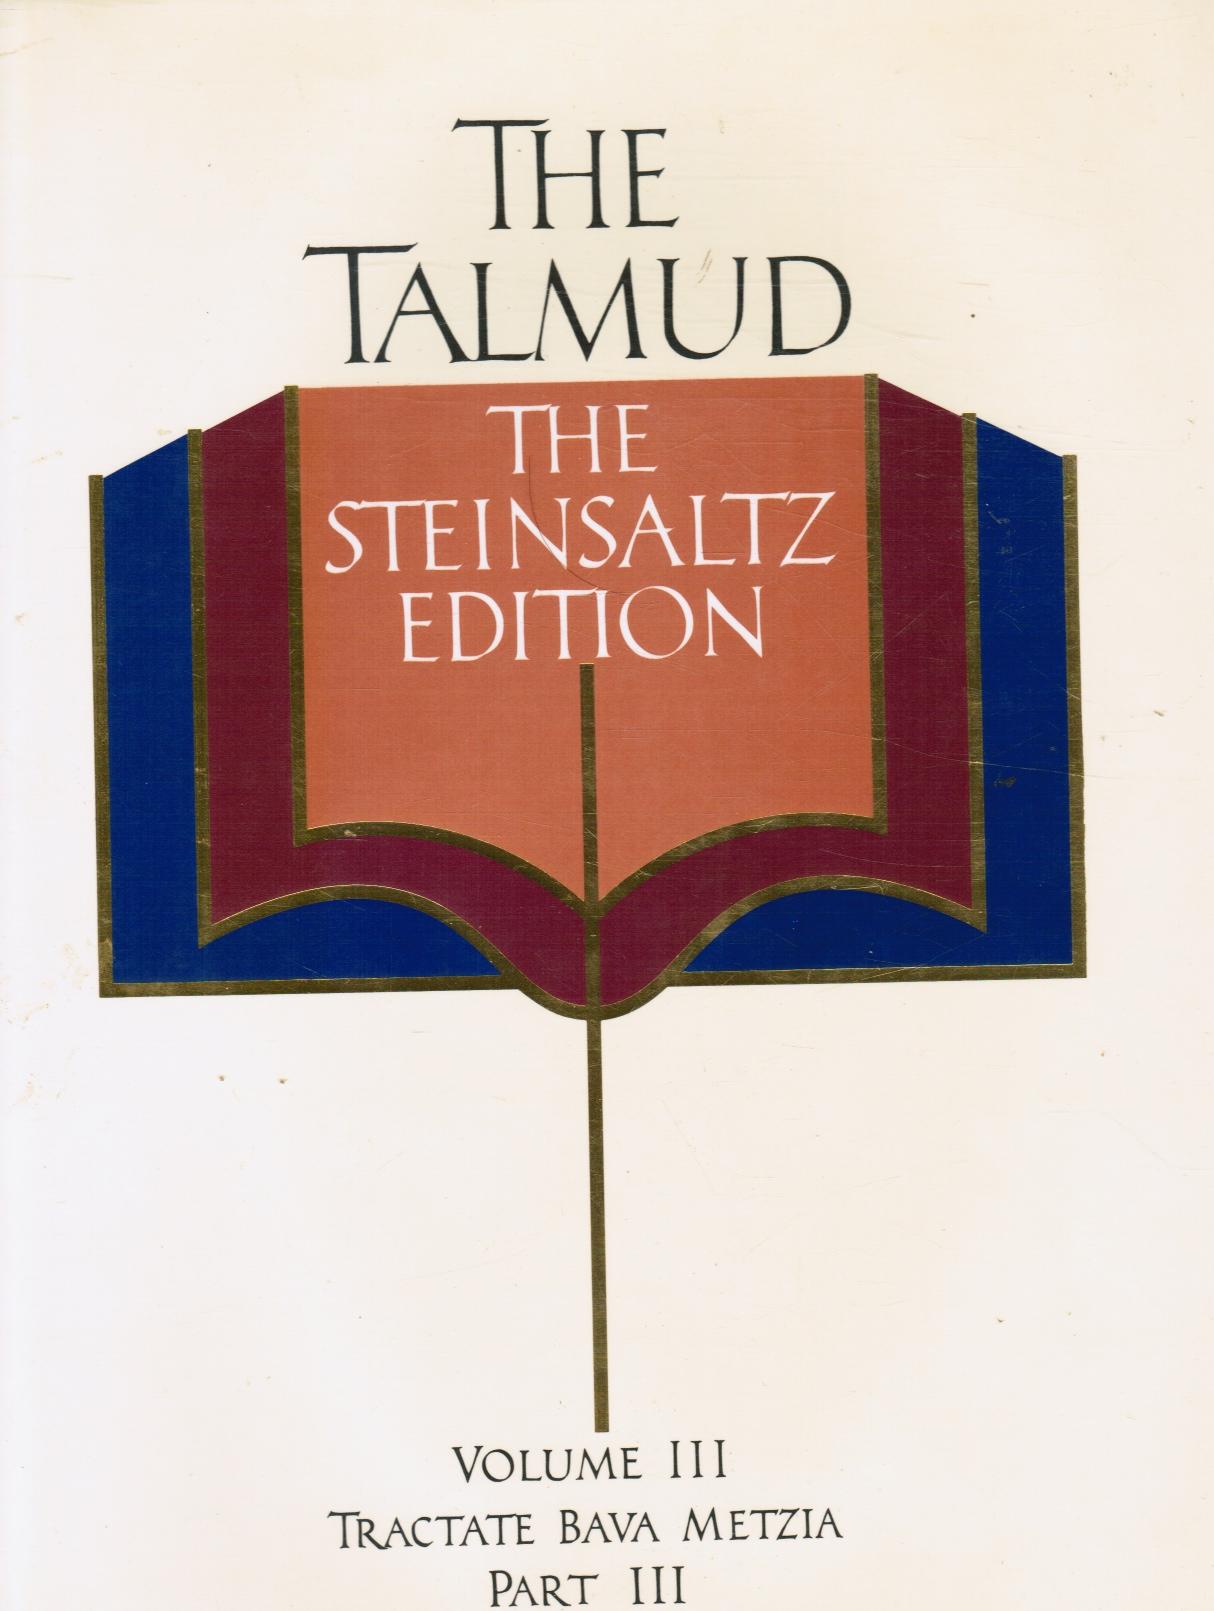 Image for The Talmud: Tractate Bava Metzia, Part 3, the Steinsaltz Editon